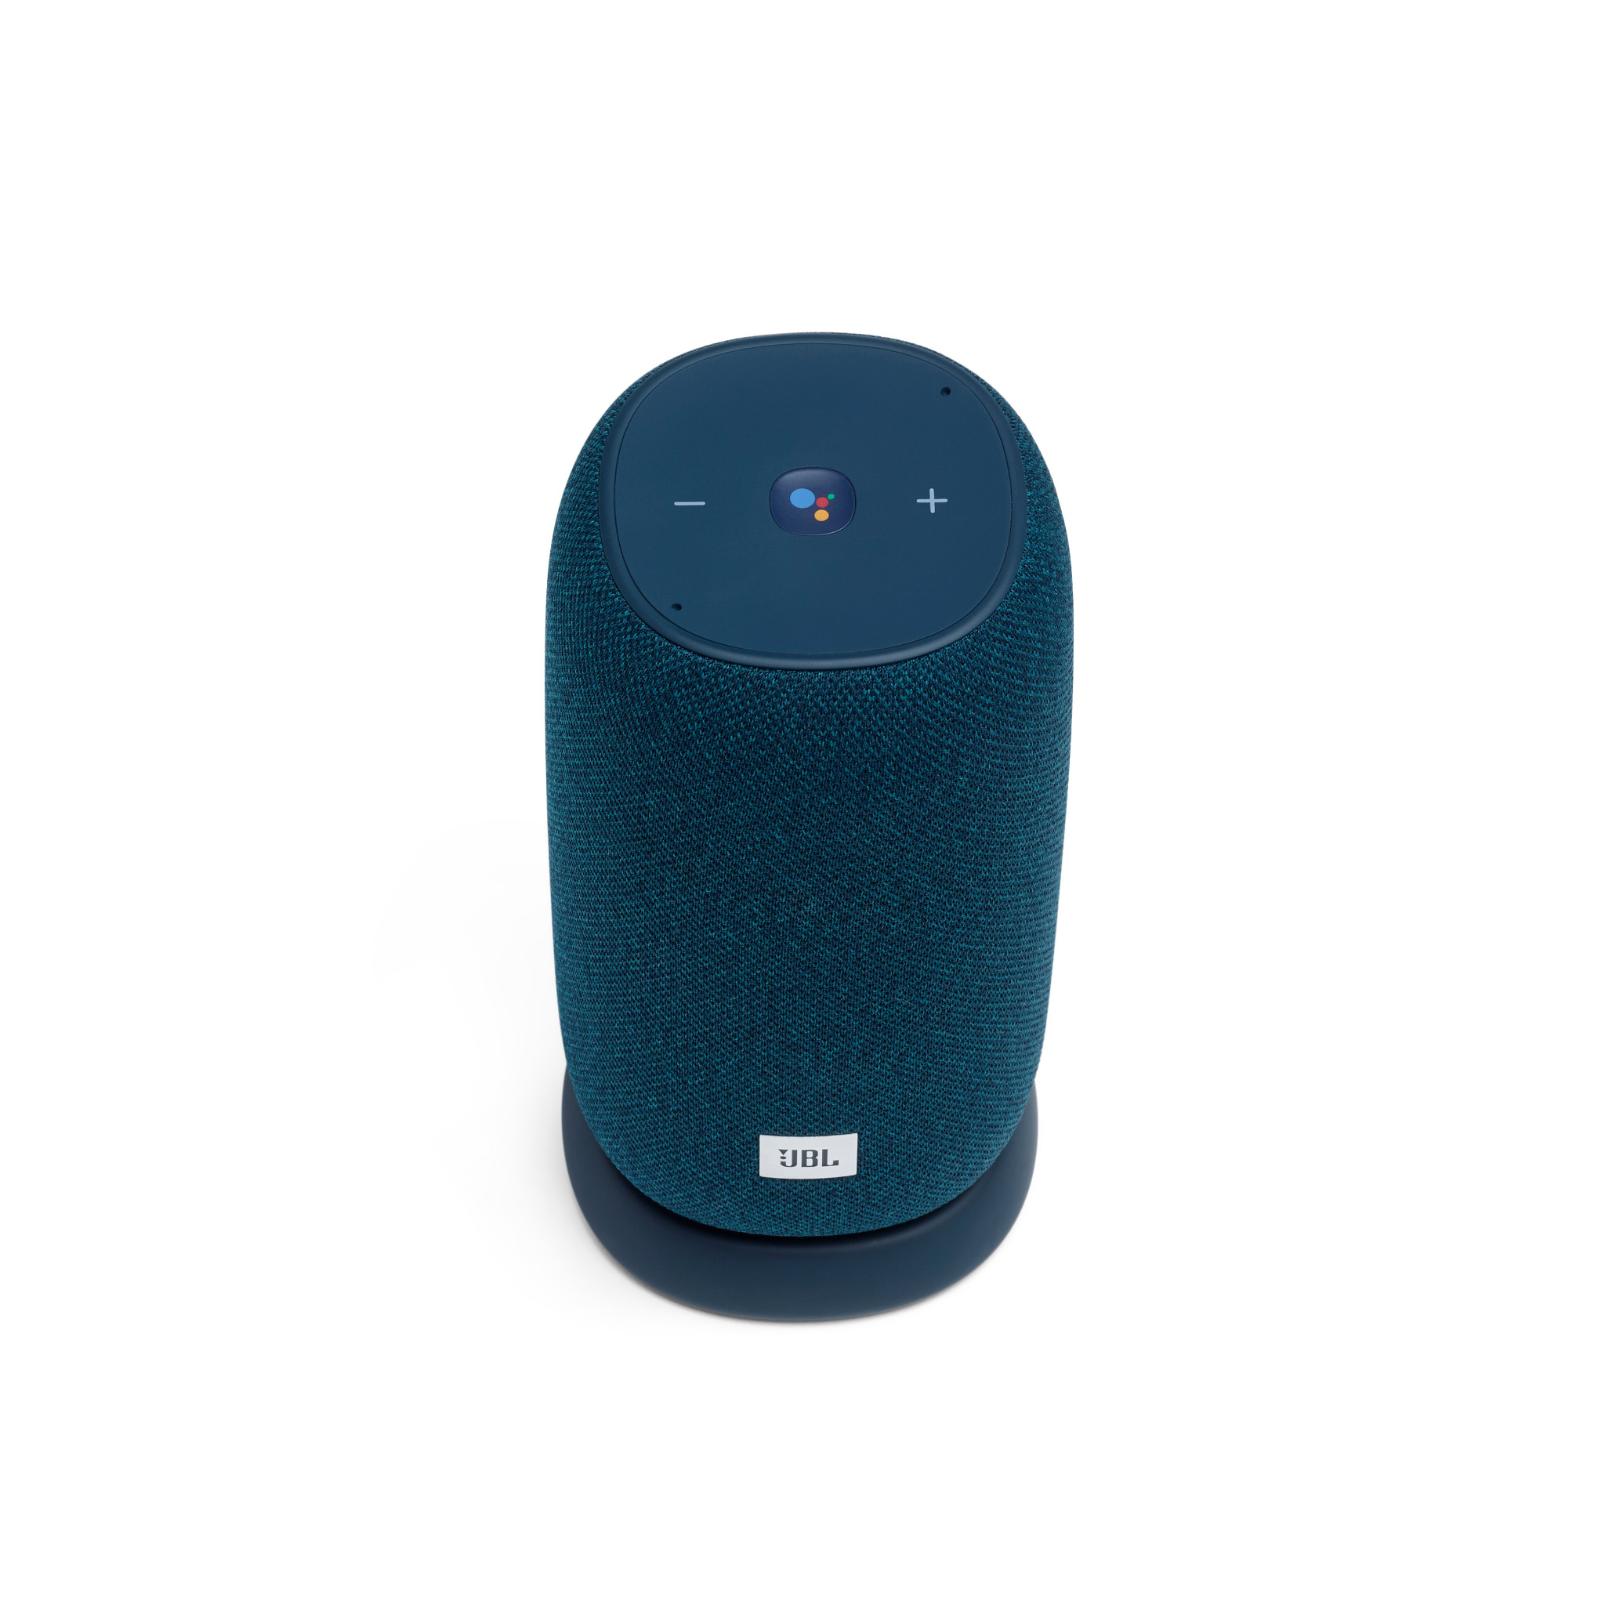 JBL Link Portable - Blue - Portable Wi-Fi Speaker - Front